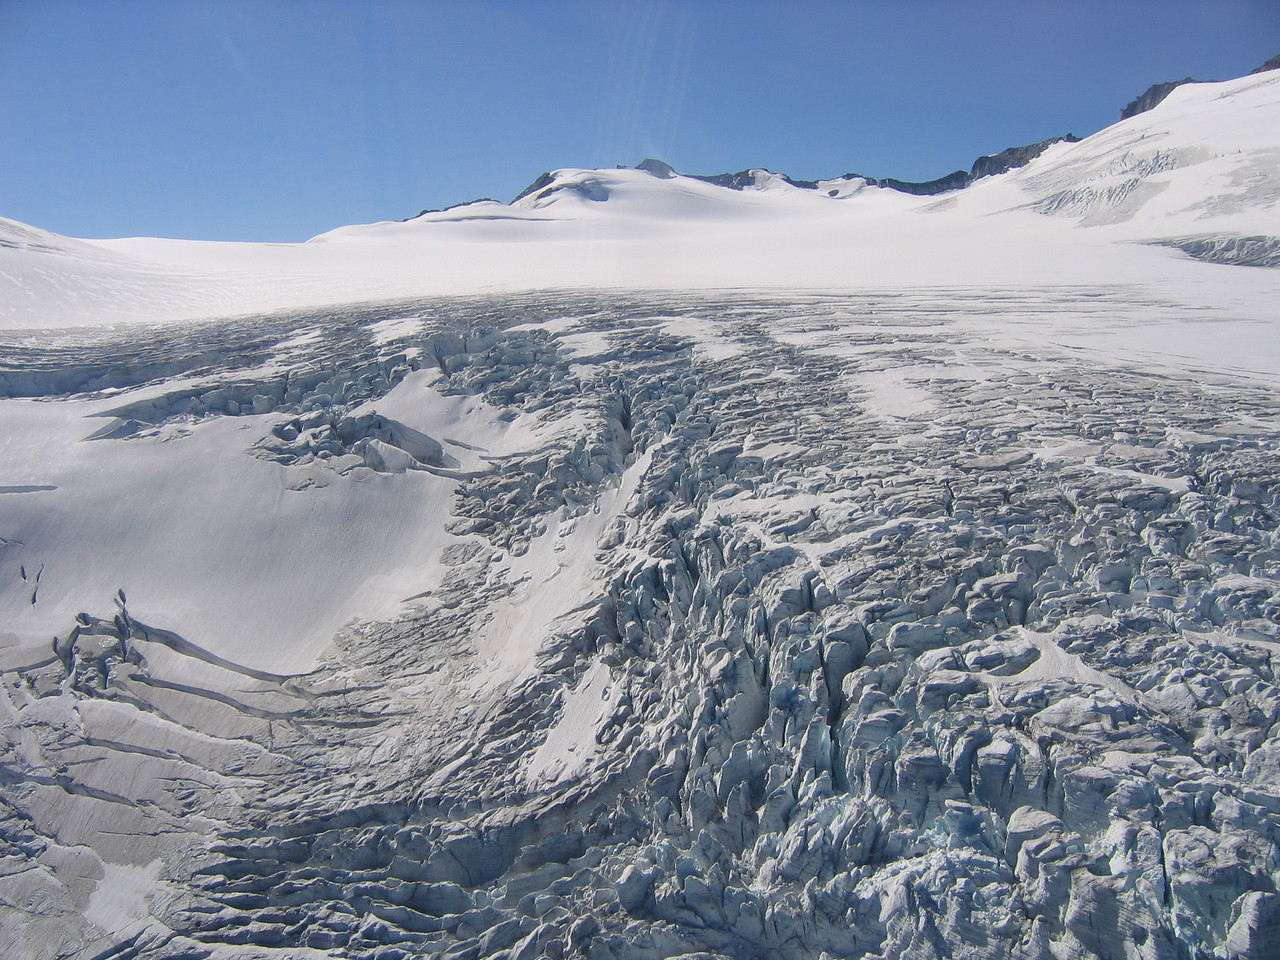 Fly by a glacier